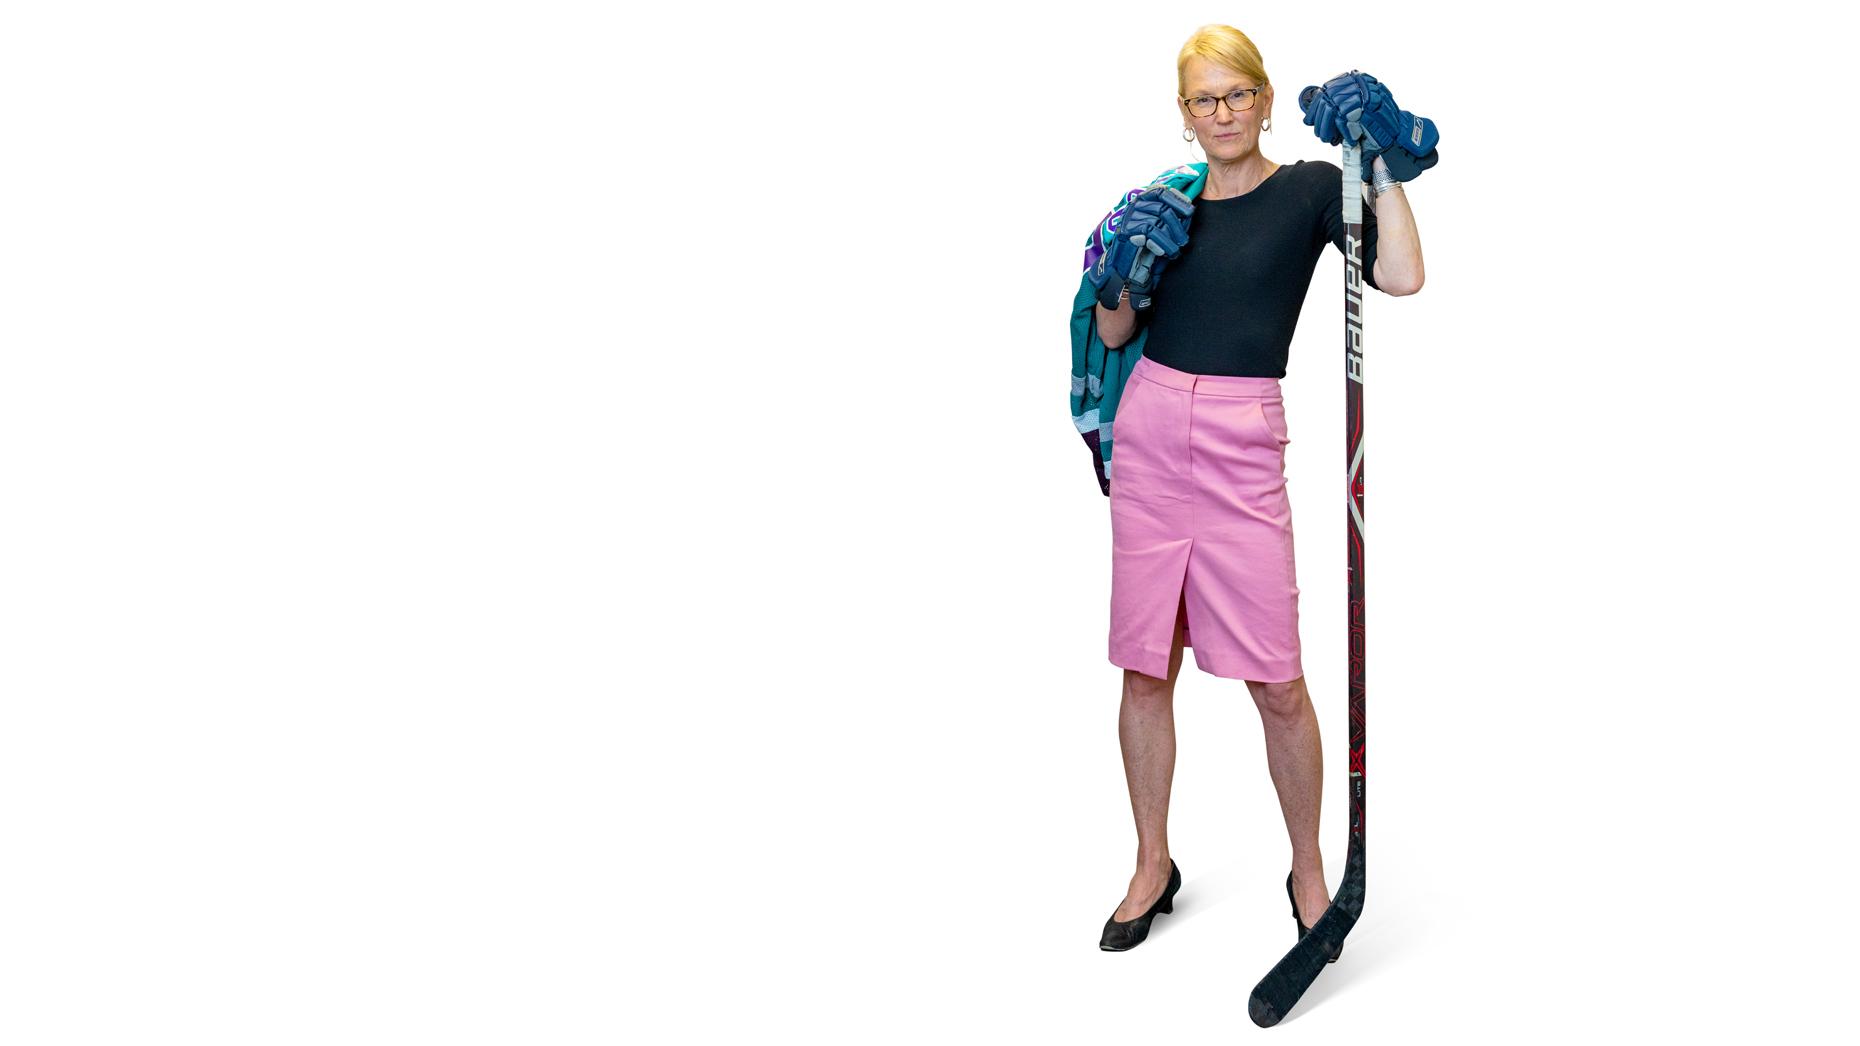 Molly Kellogg of Waterbury CT wearing hockey goalie gloves and holding a hockey stick